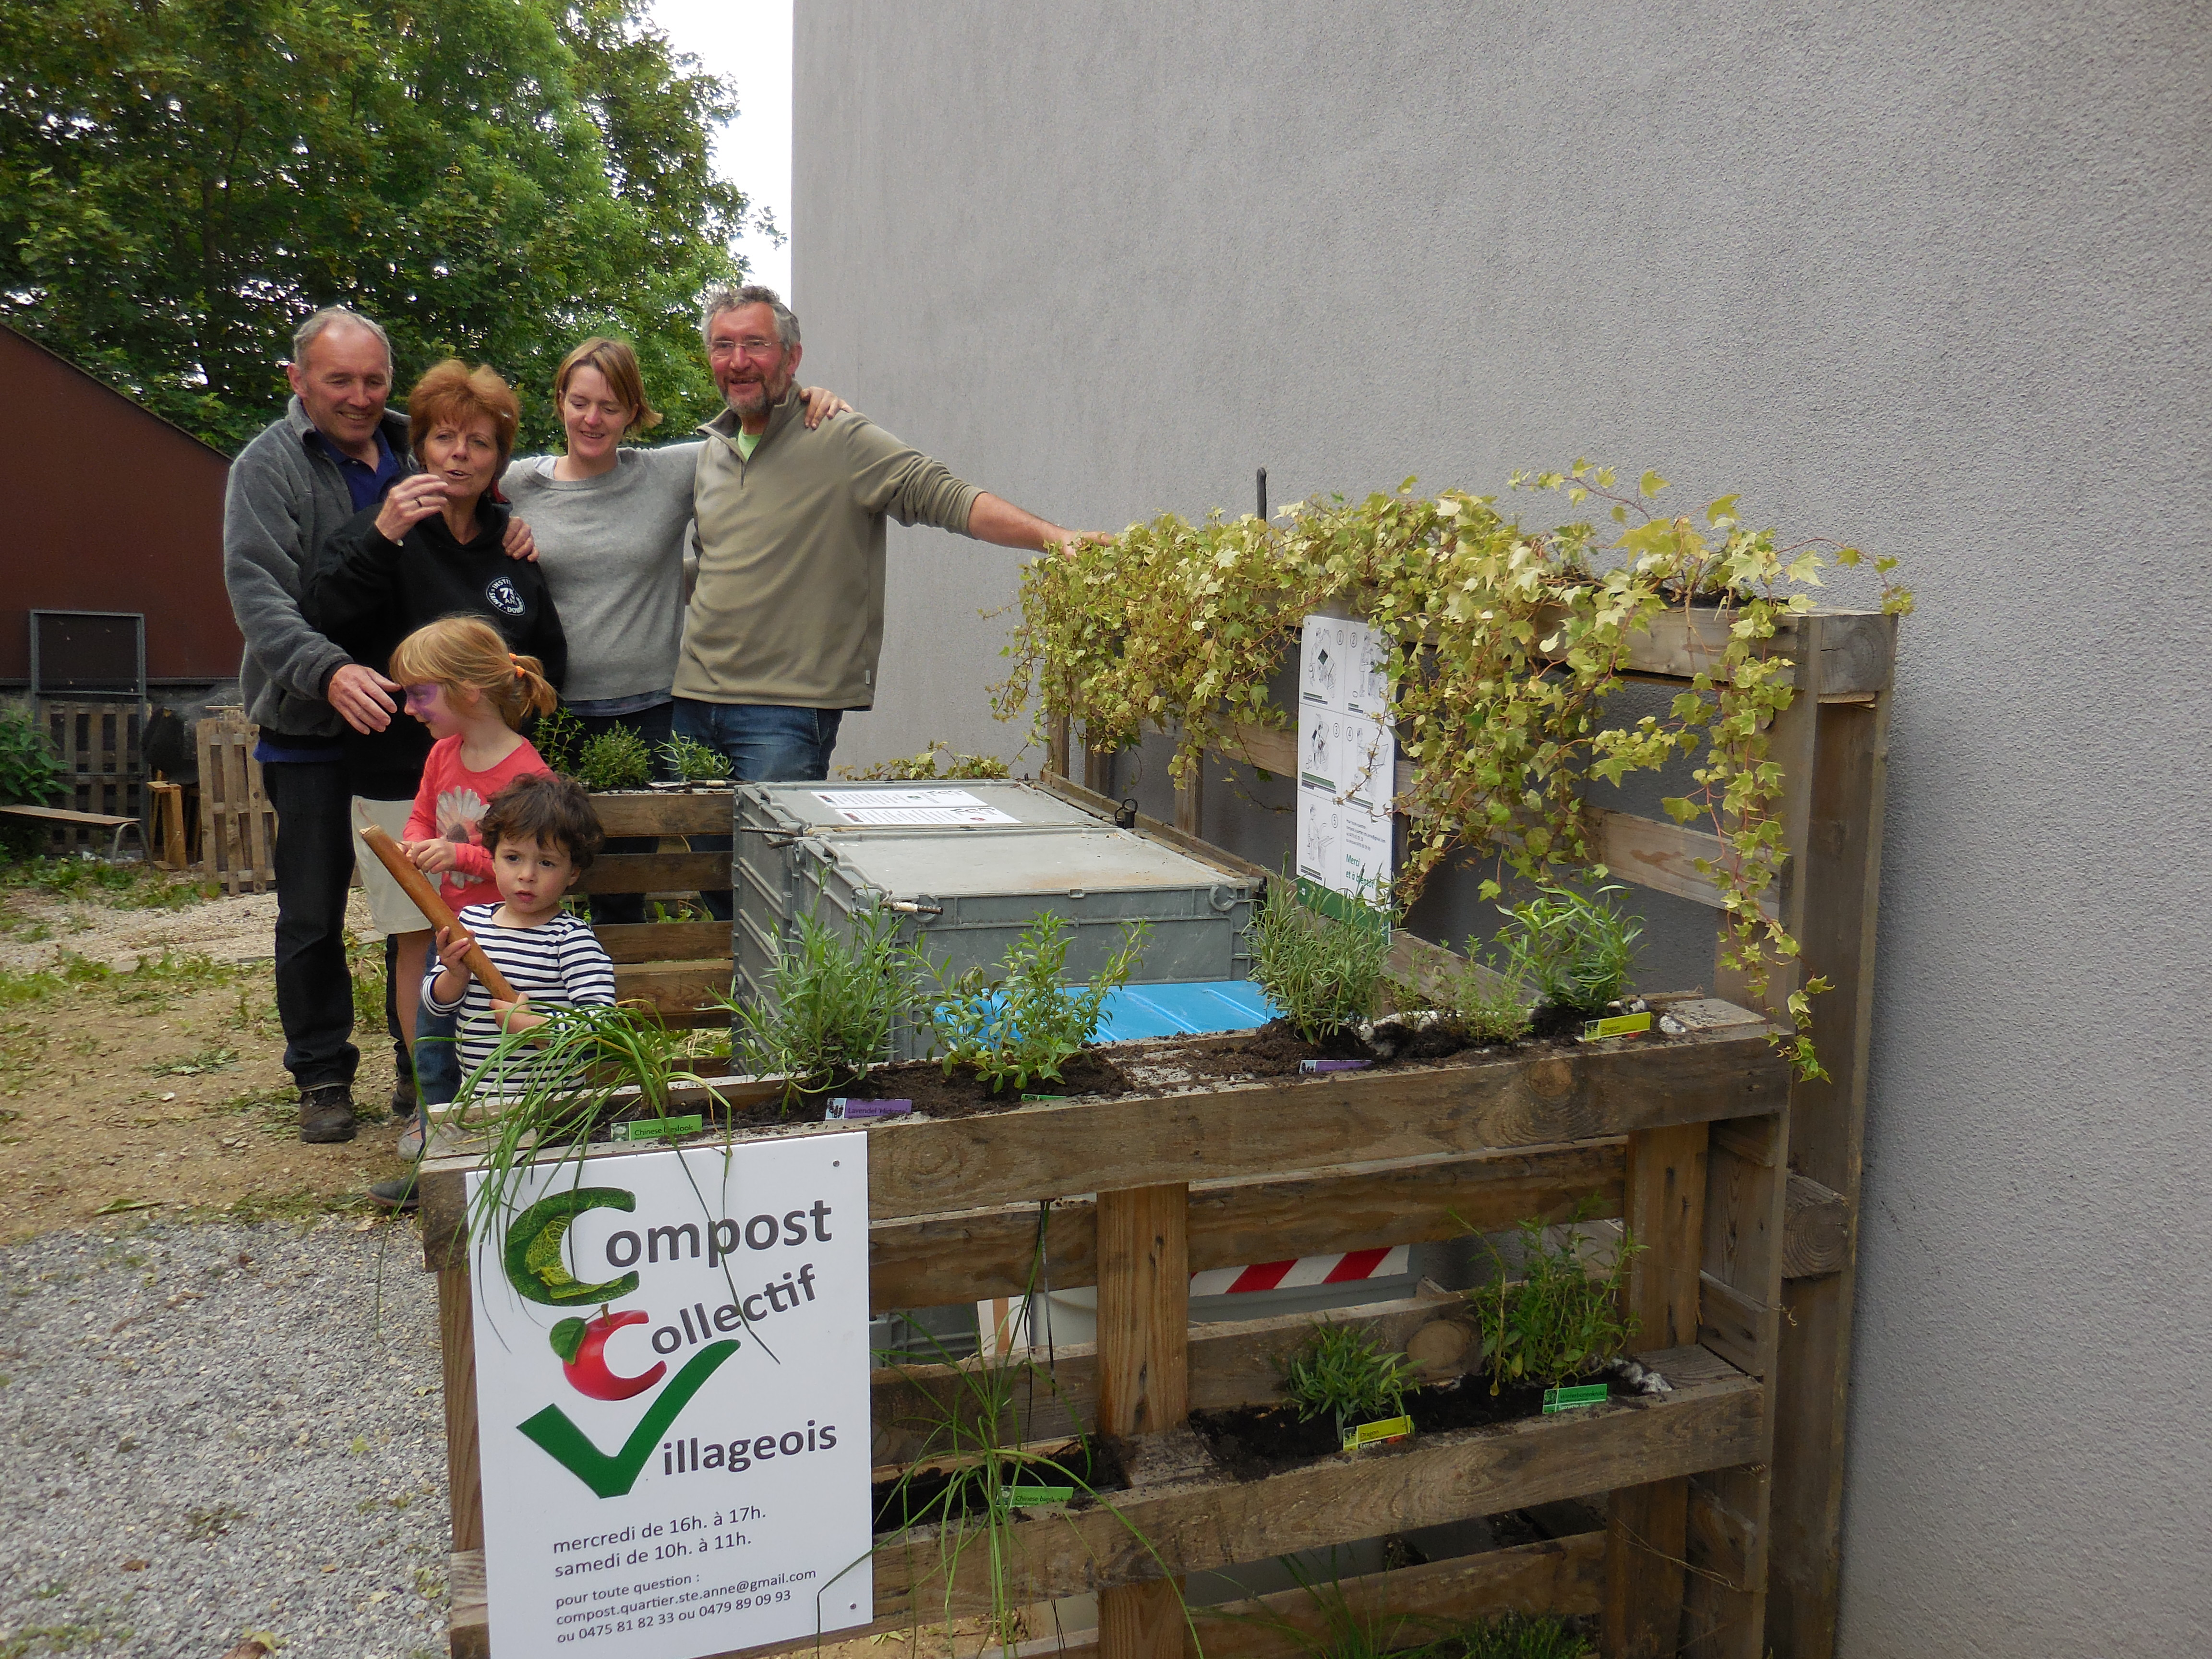 Compost Collectif Villageois